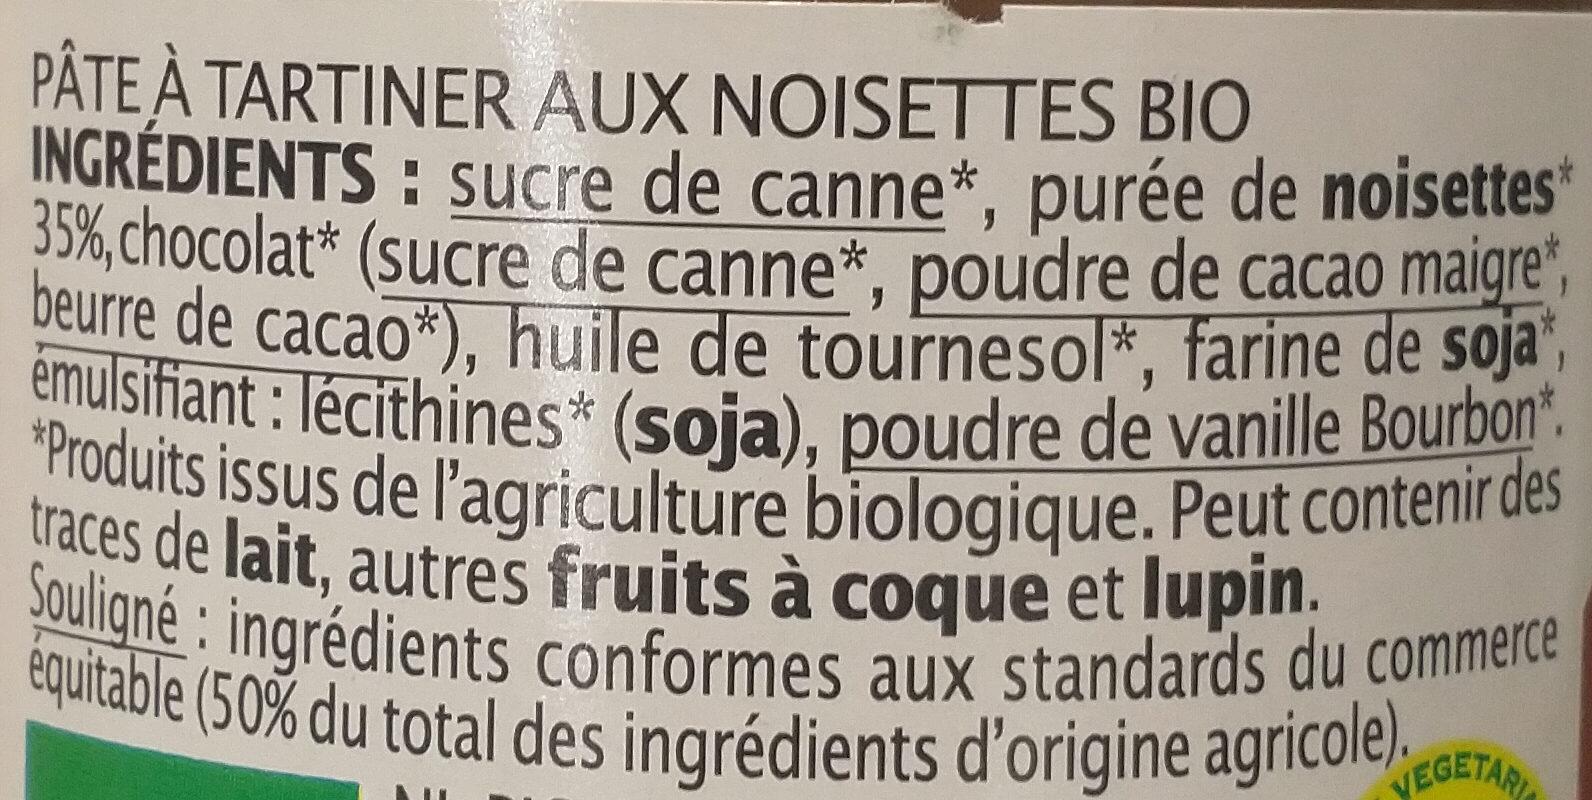 Pâte à tartiner 35% noisettes - Ingredients - fr